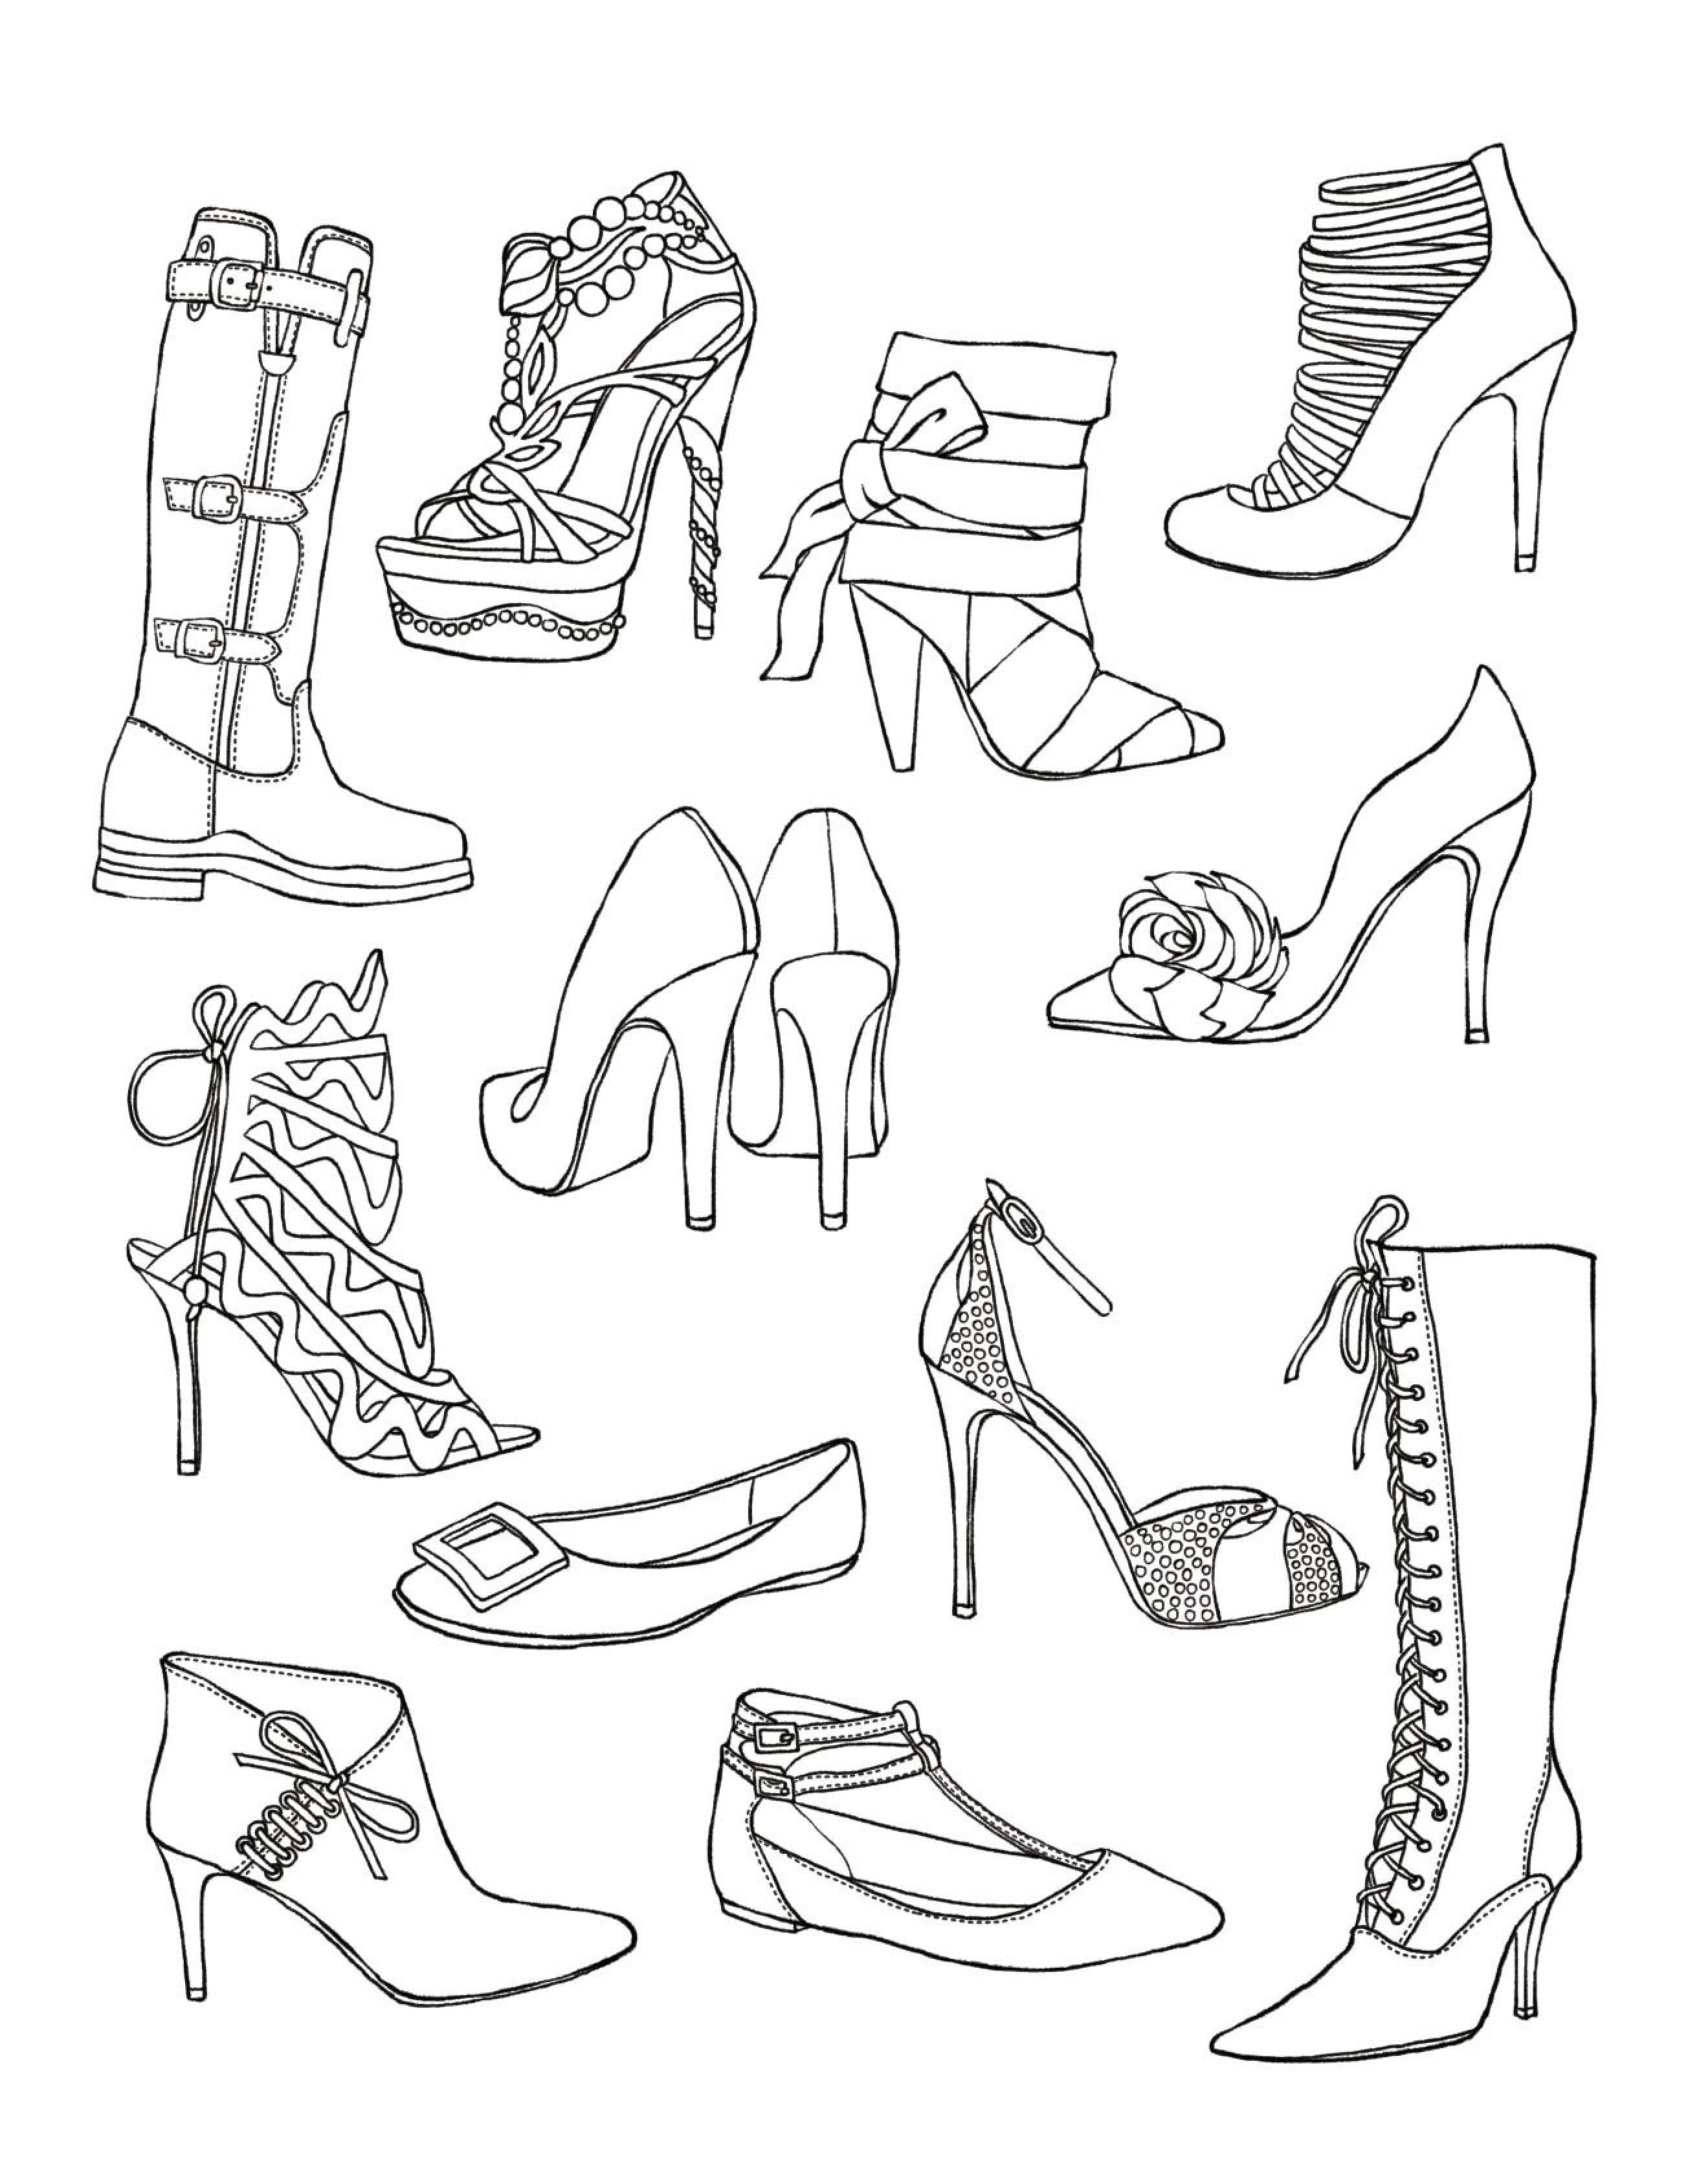 Shoes Coloring Page Fun Stuff Pinterest